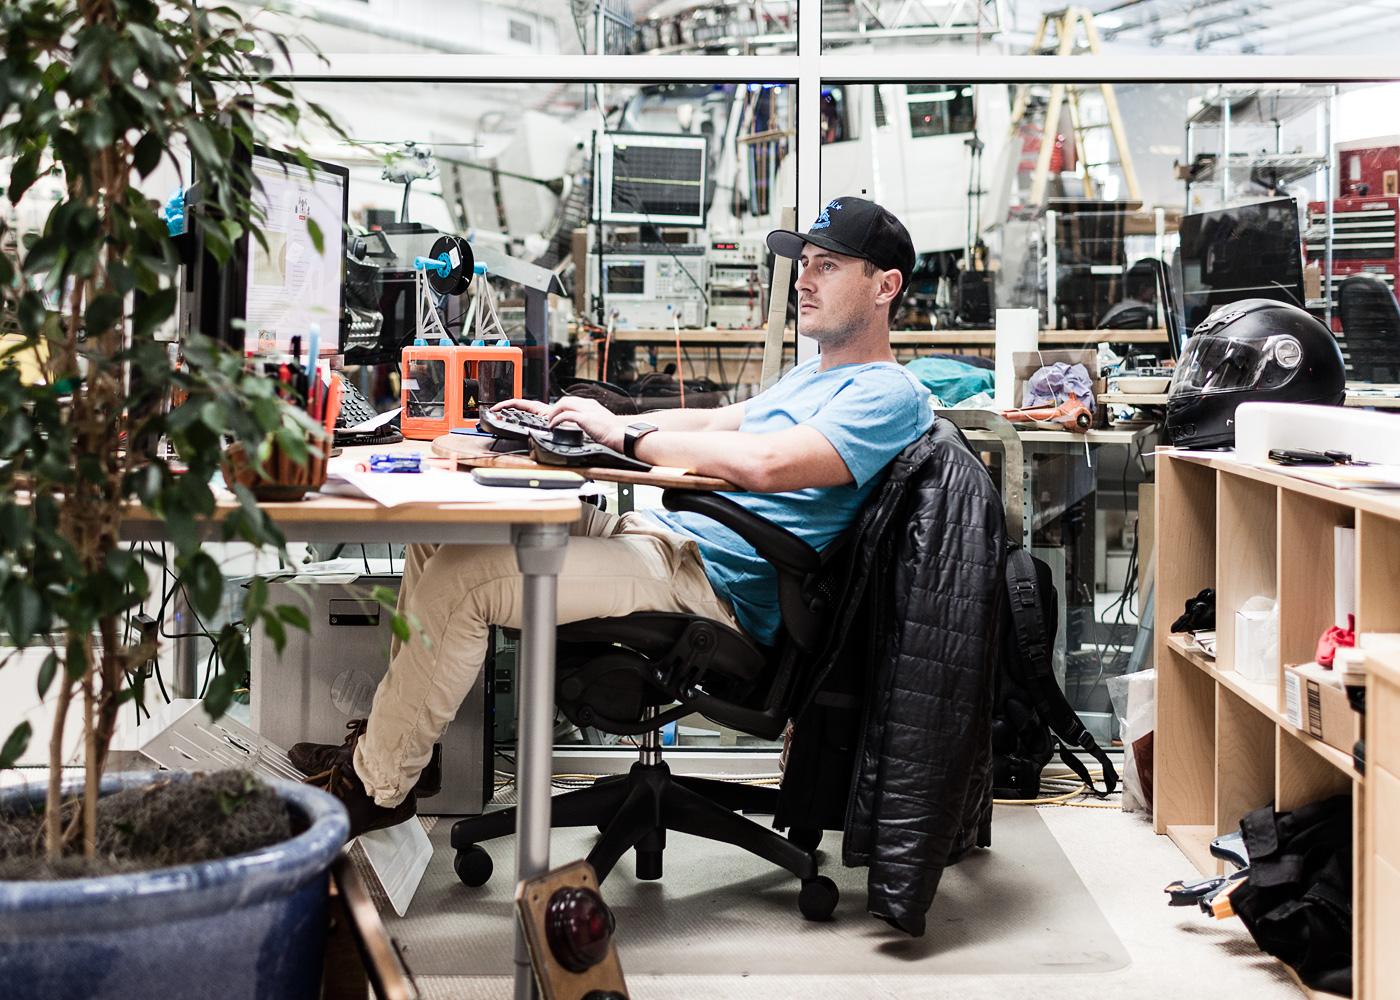 Jeff Clark, design engineering tech at Applied Minds / brand eins Thema